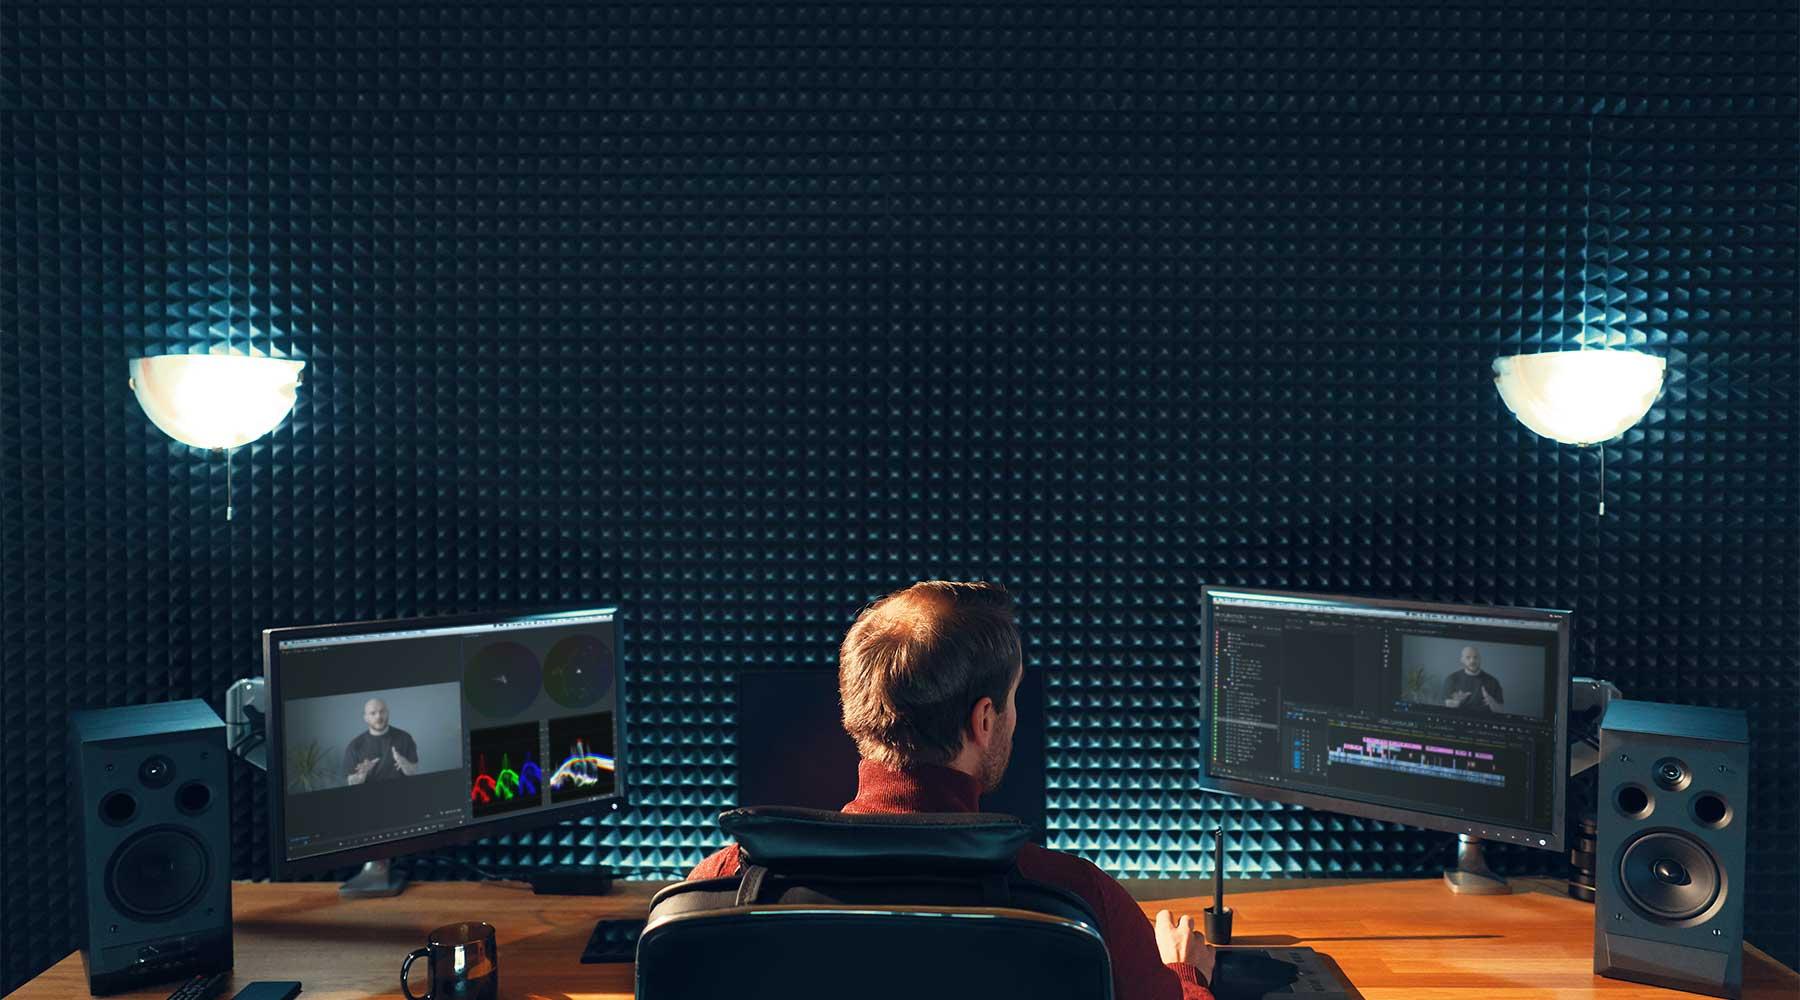 Premiere-Pro-Editor-in-edit-suite